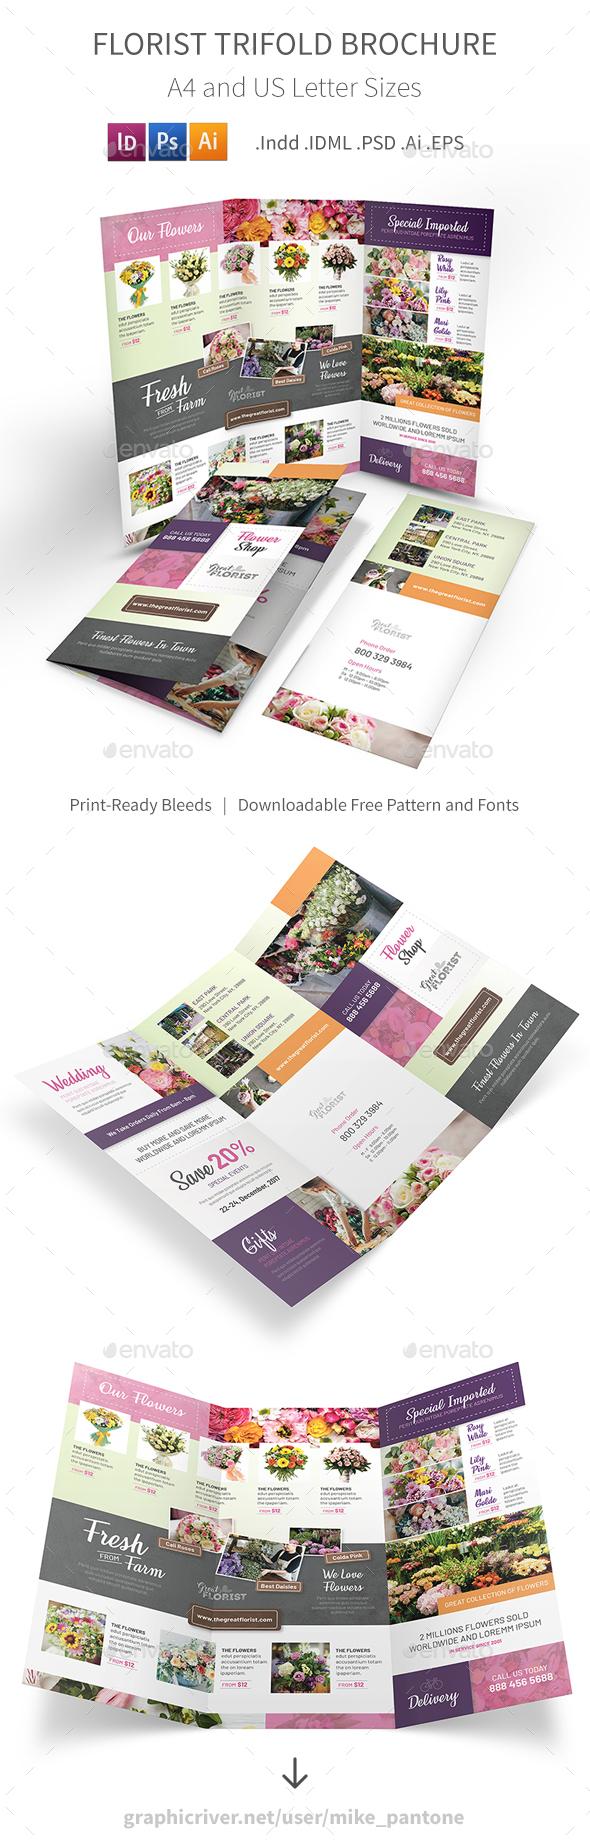 Florist Trifold Brochure 3 - Informational Brochures